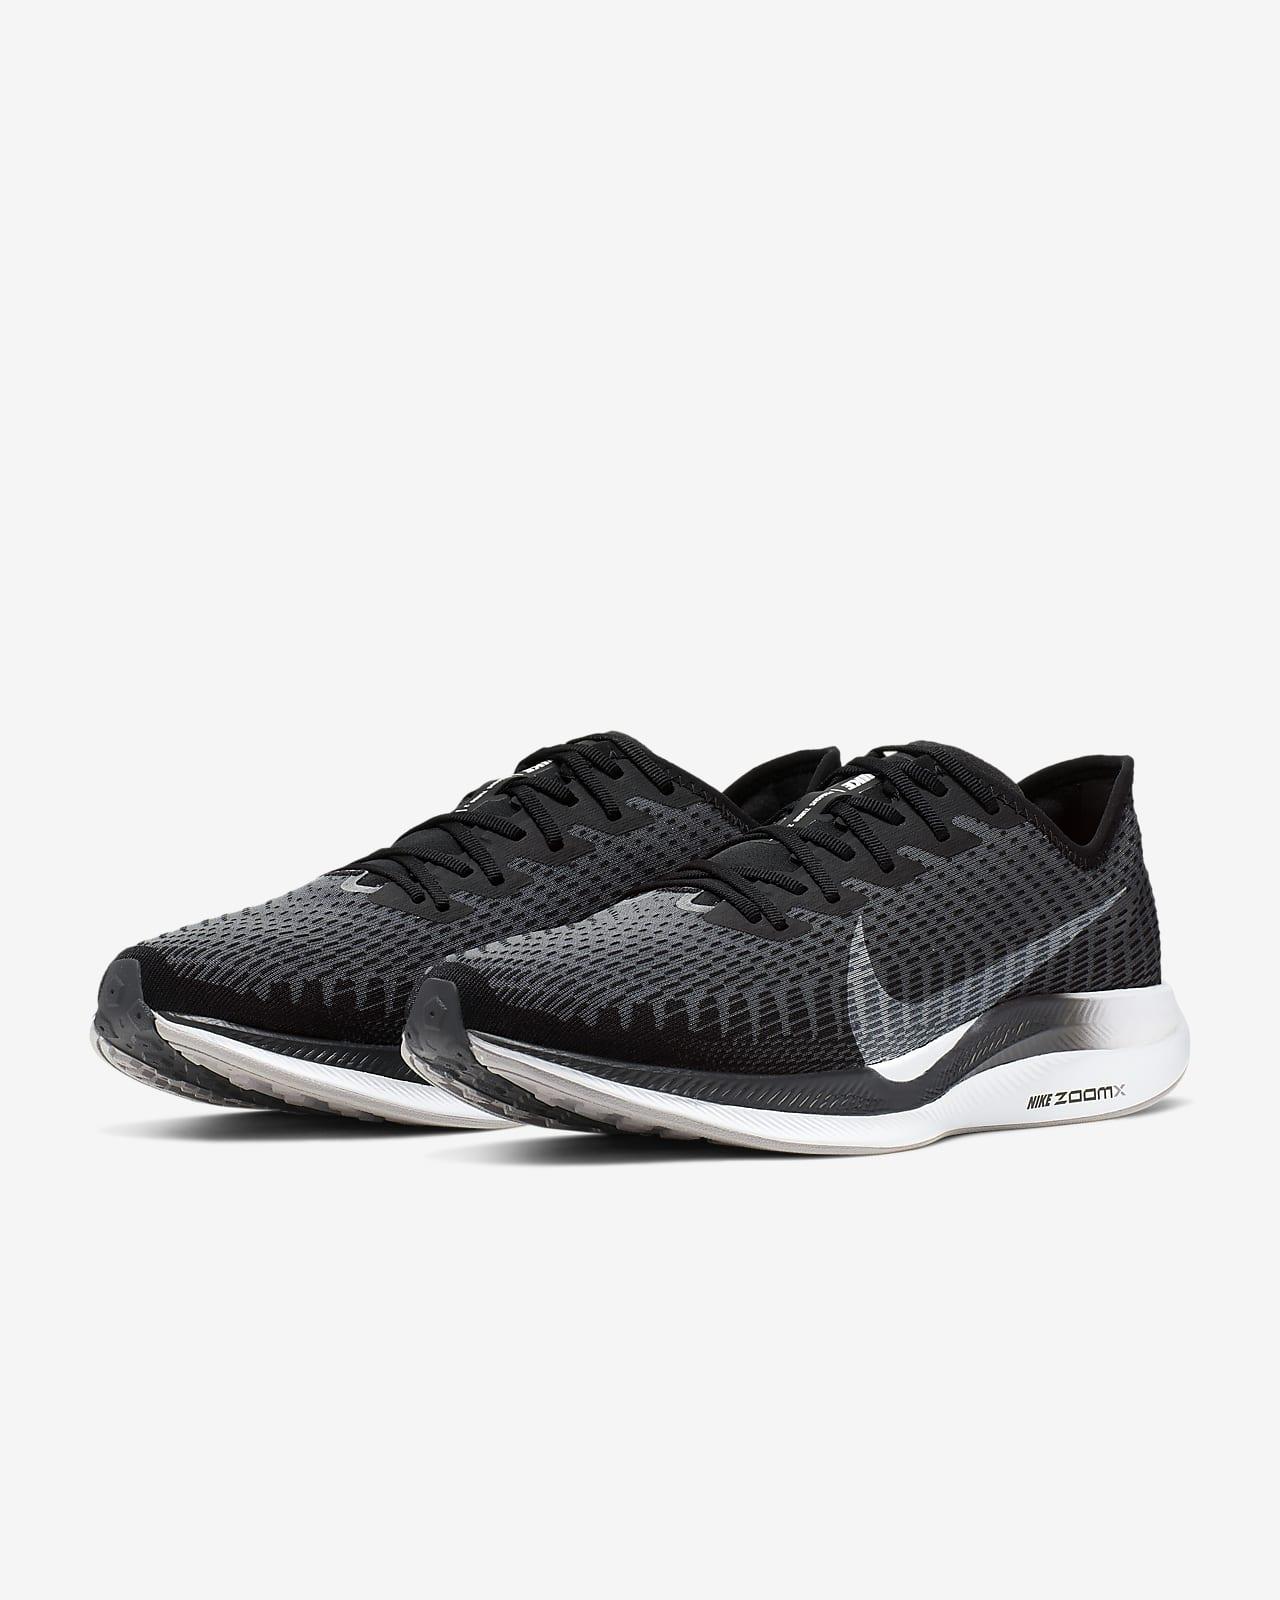 Senato spesso Resa  Nike Zoom Pegasus Turbo 2 Men's Running Shoe. Nike LU